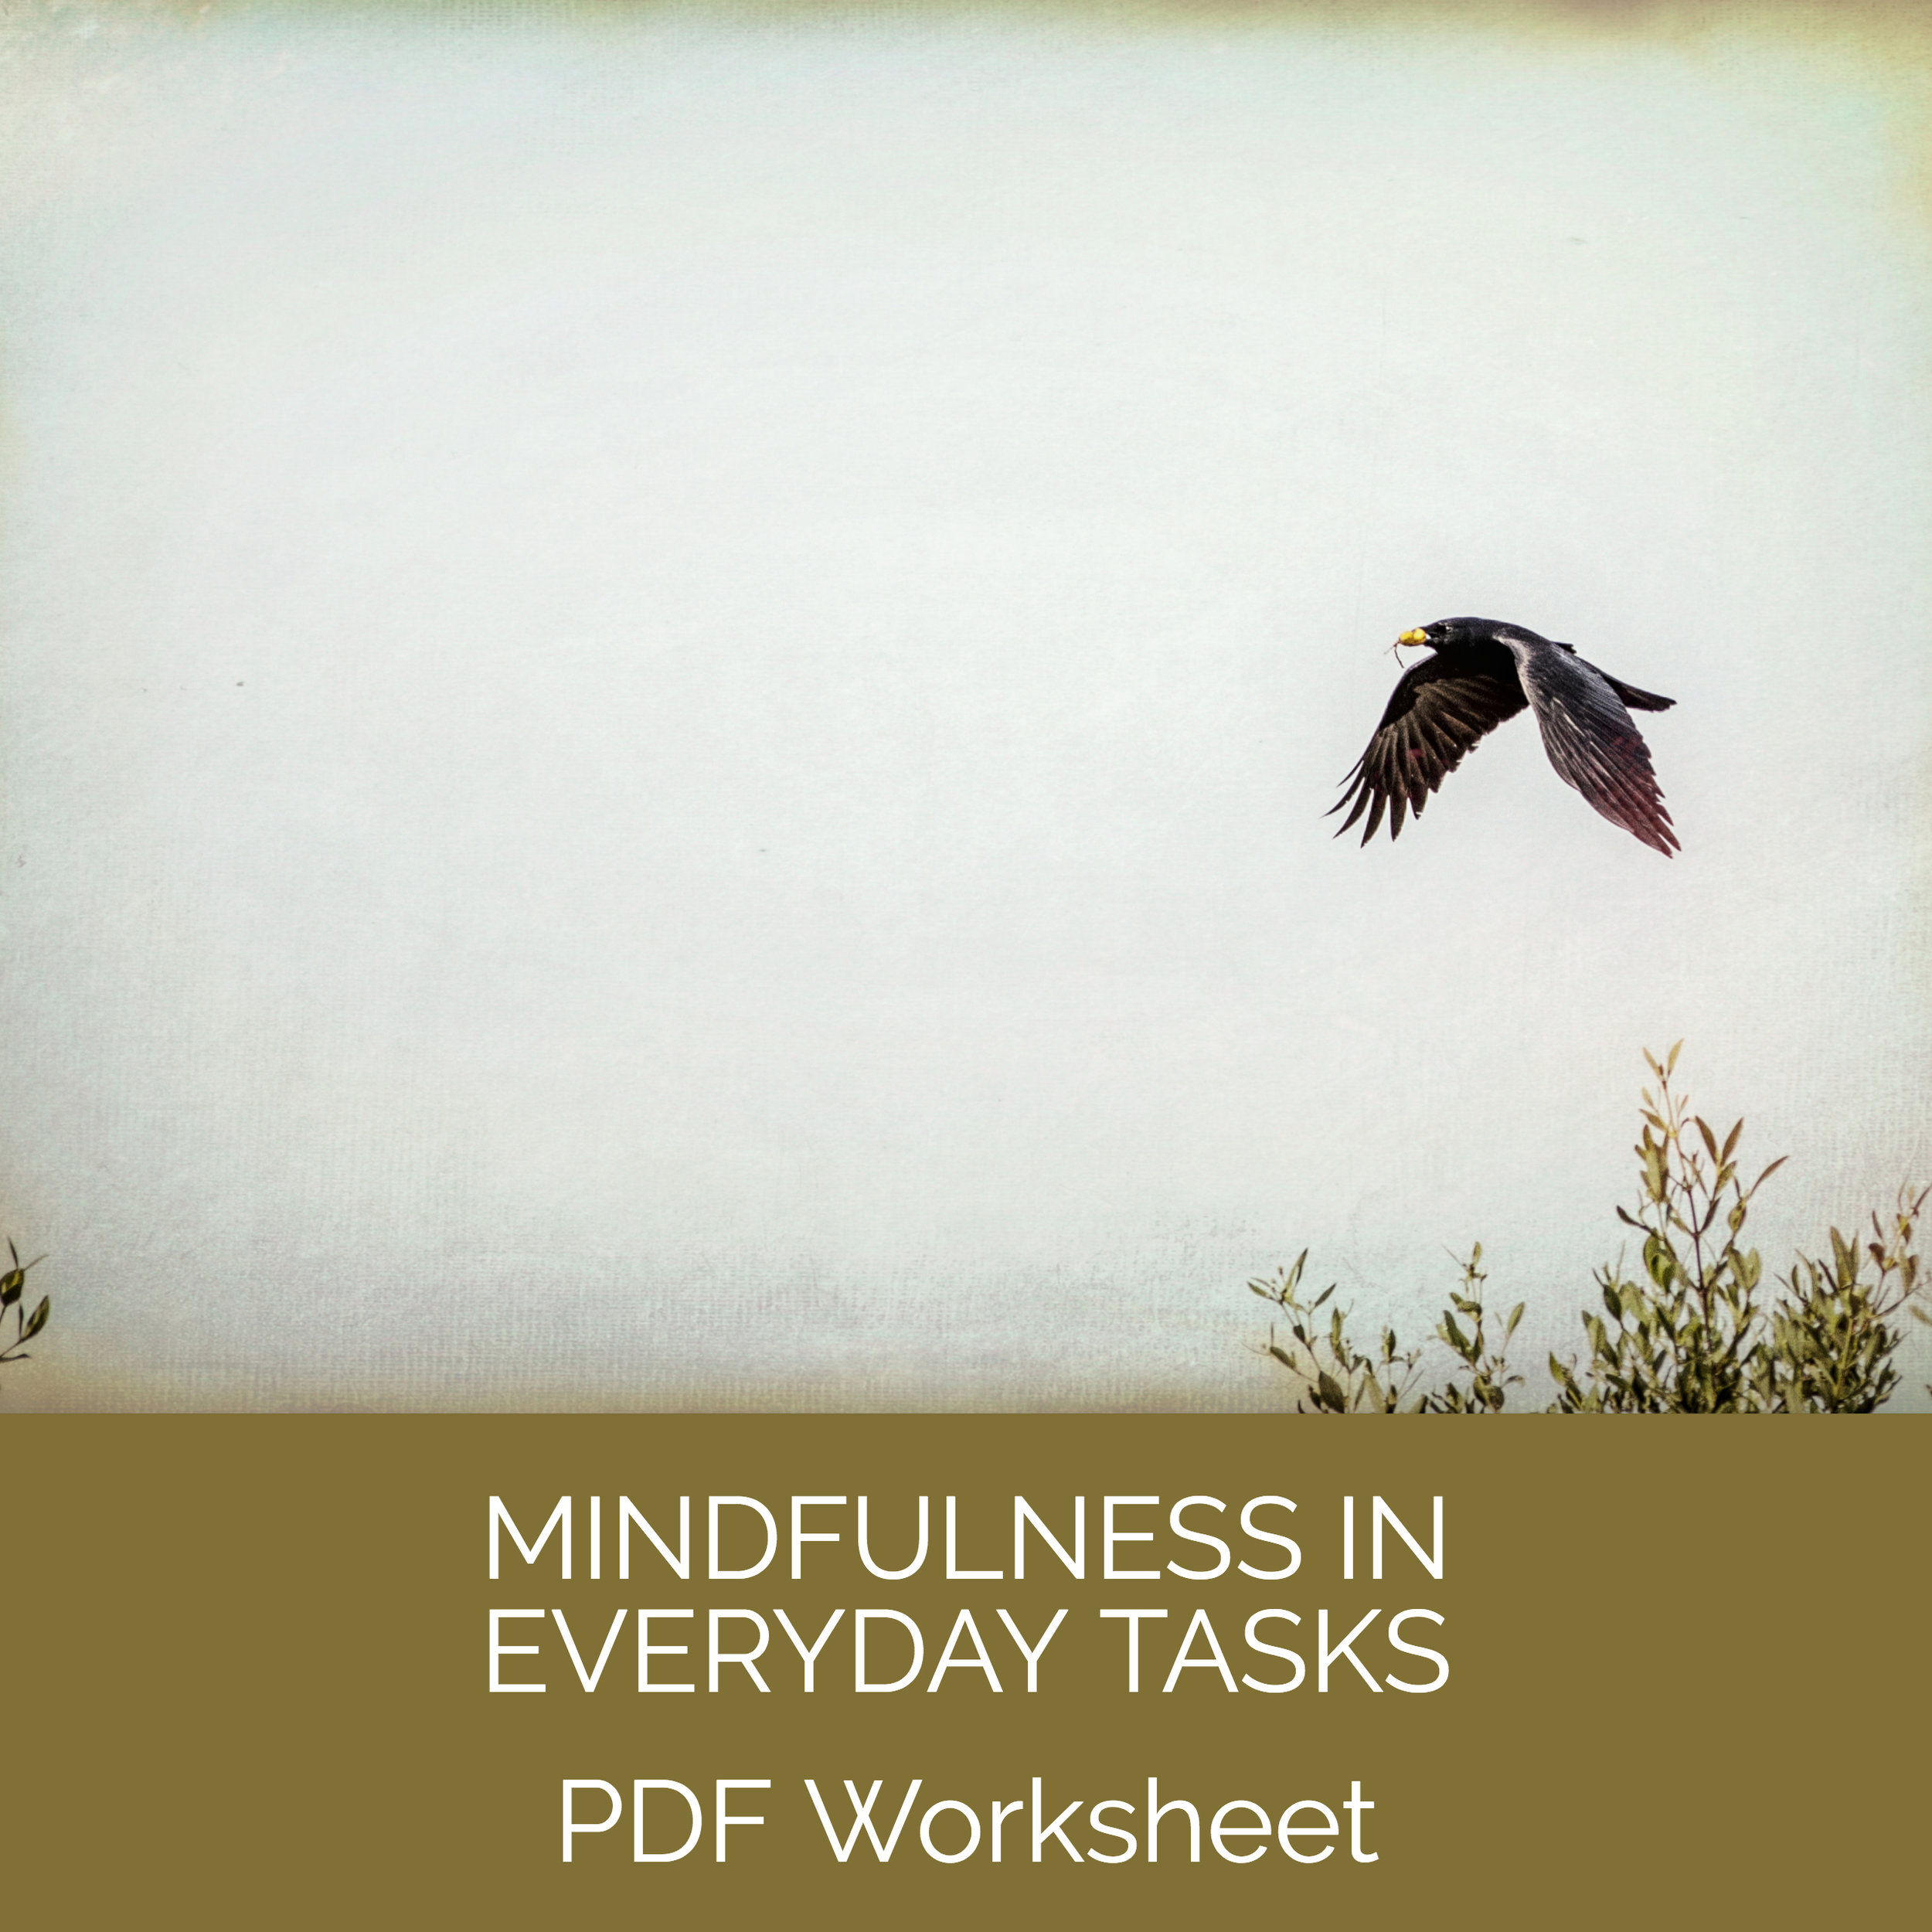 Mindfulness in Everyday Tasks.jpg